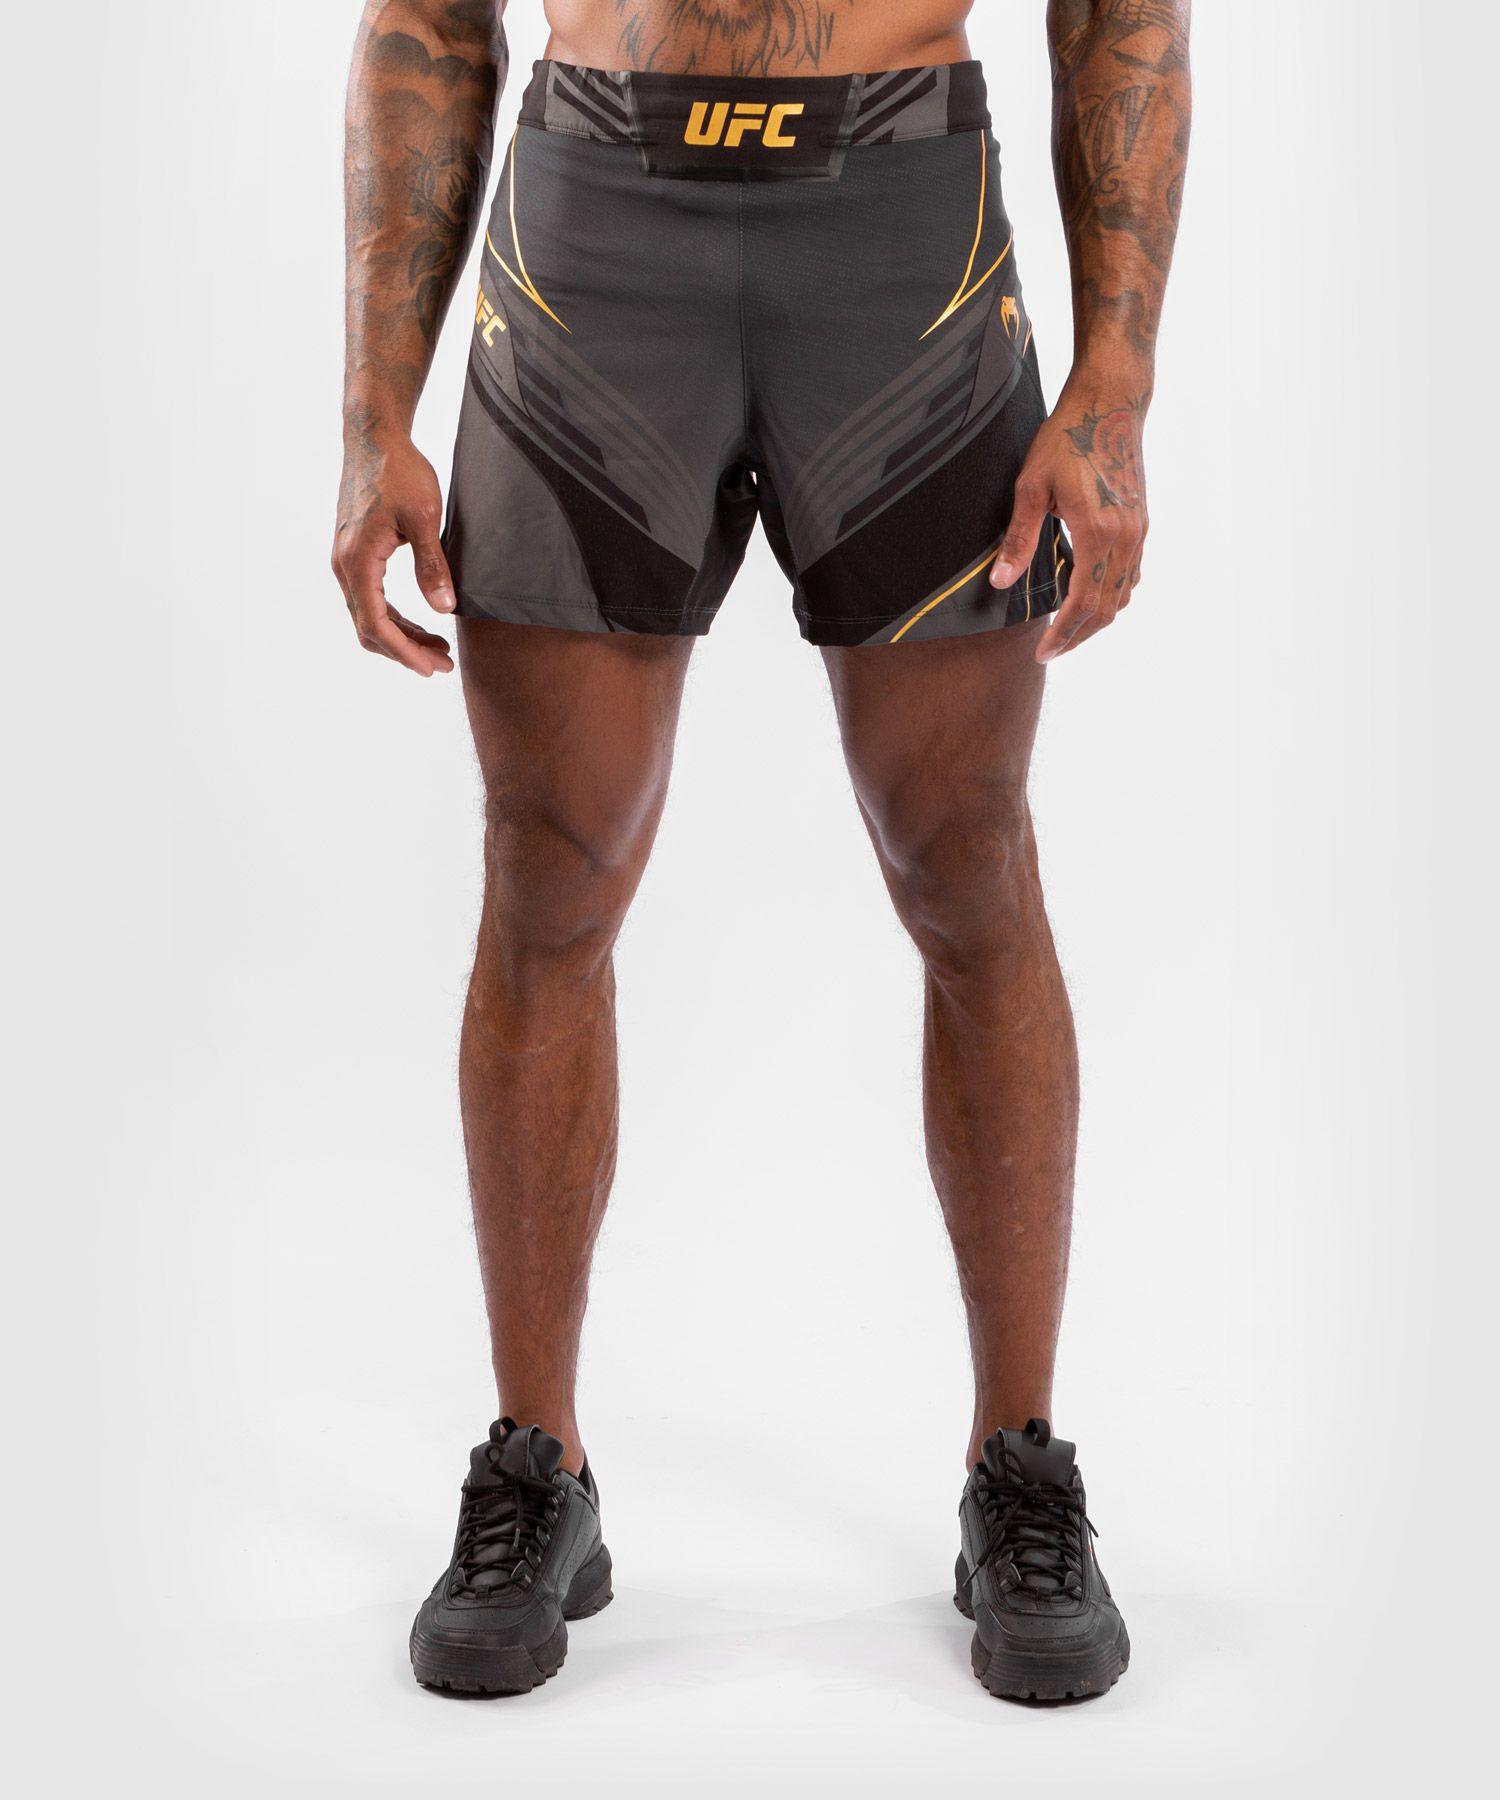 UFC Venum Authentic Fight Night Men's Shorts - Short Fit - Champion